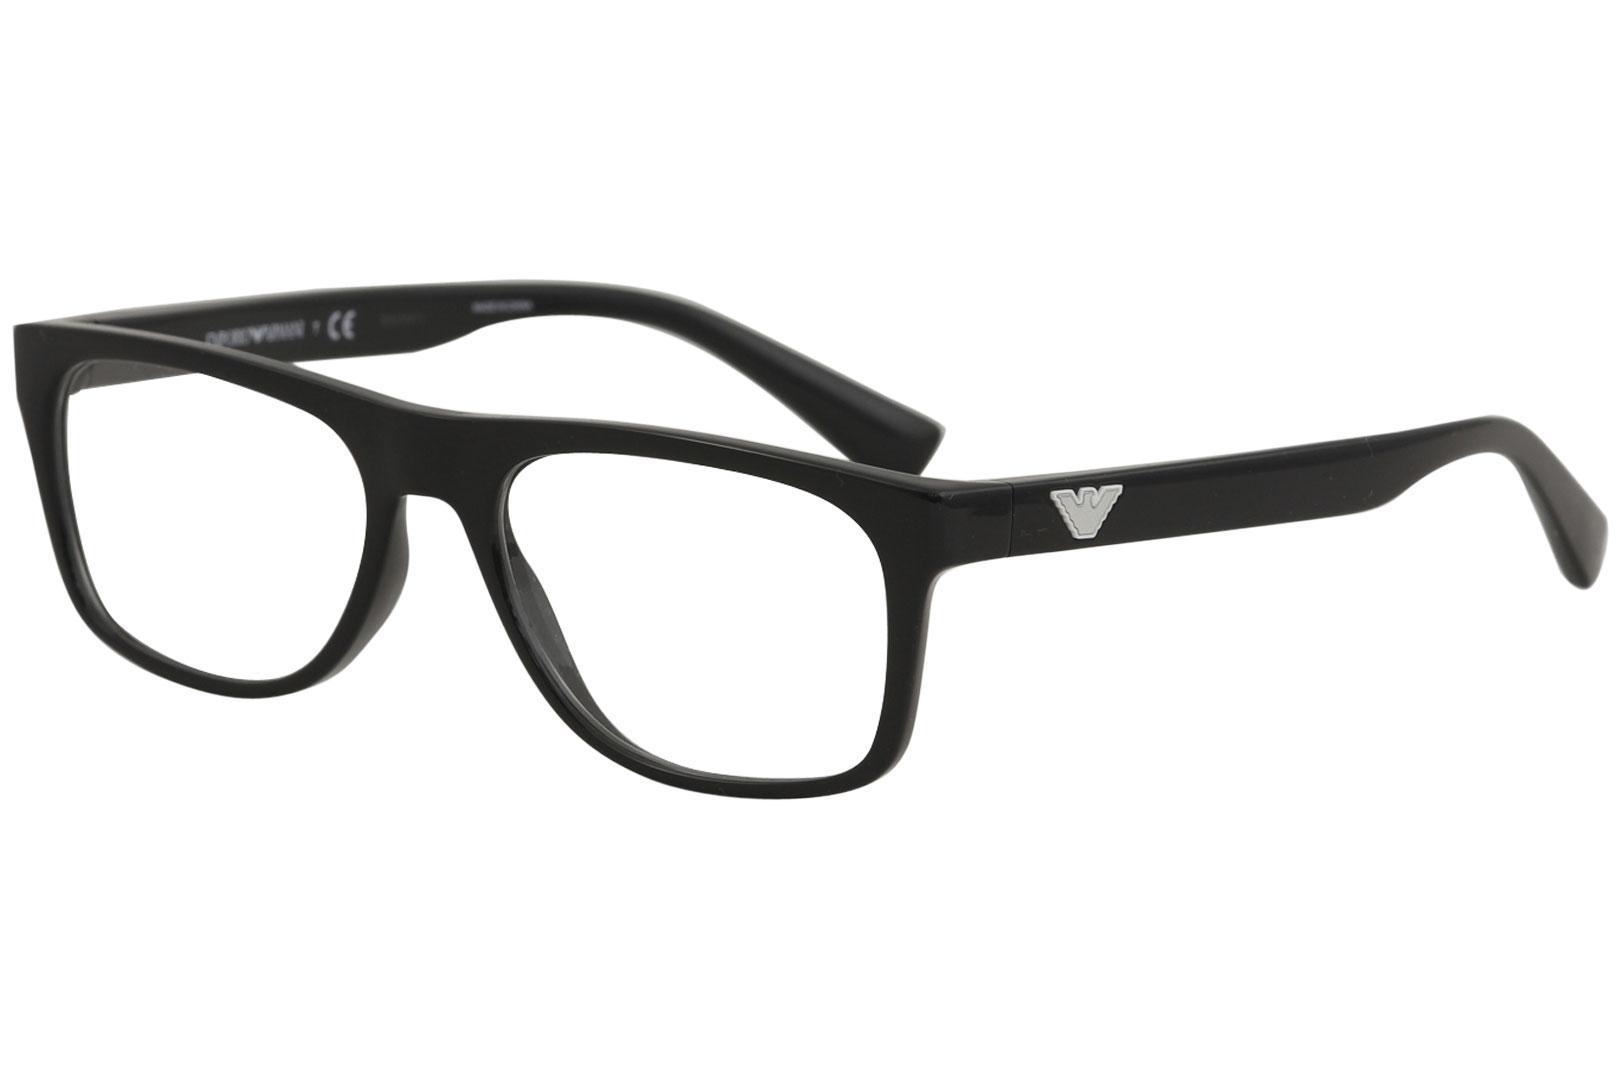 dec11f24120 Emporio Armani Men s Eyeglasses EA3097 EA 3097 Full Rim Optical Frame by Emporio  Armani